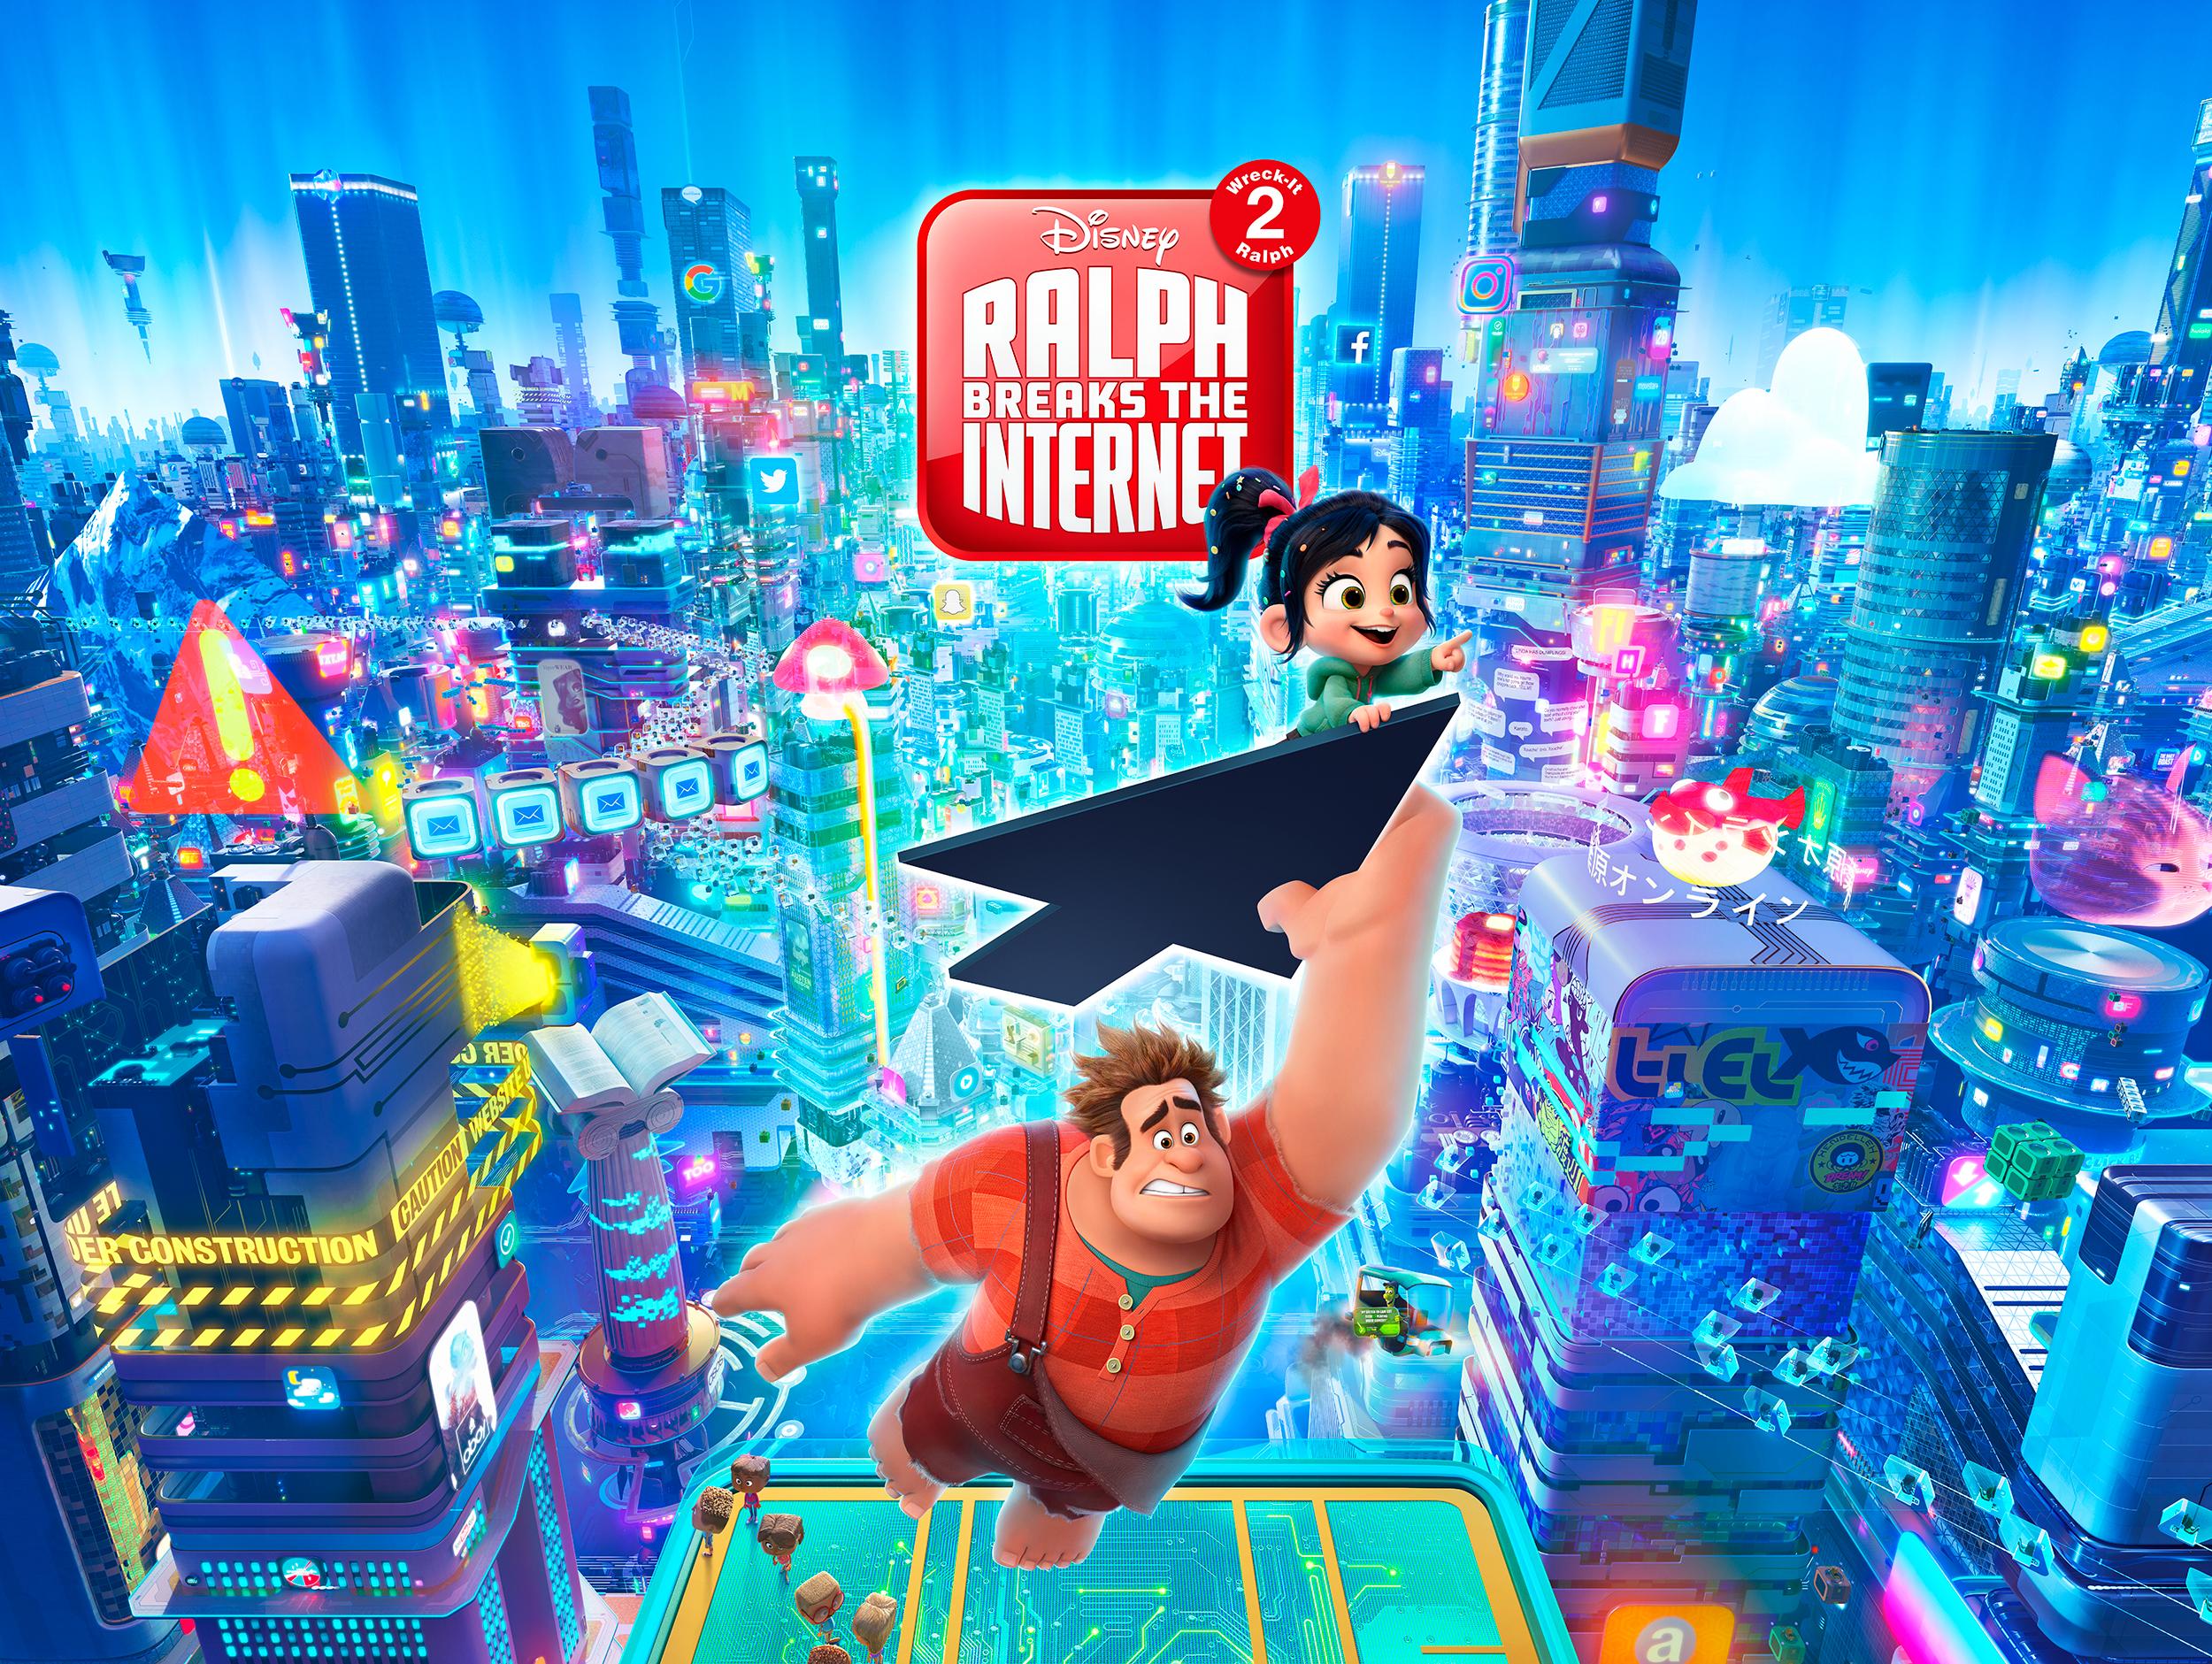 Wreck It Ralph Animation Movie 4k Hd Desktop Wallpaper For: RALPH BREAKS THE INTERNET